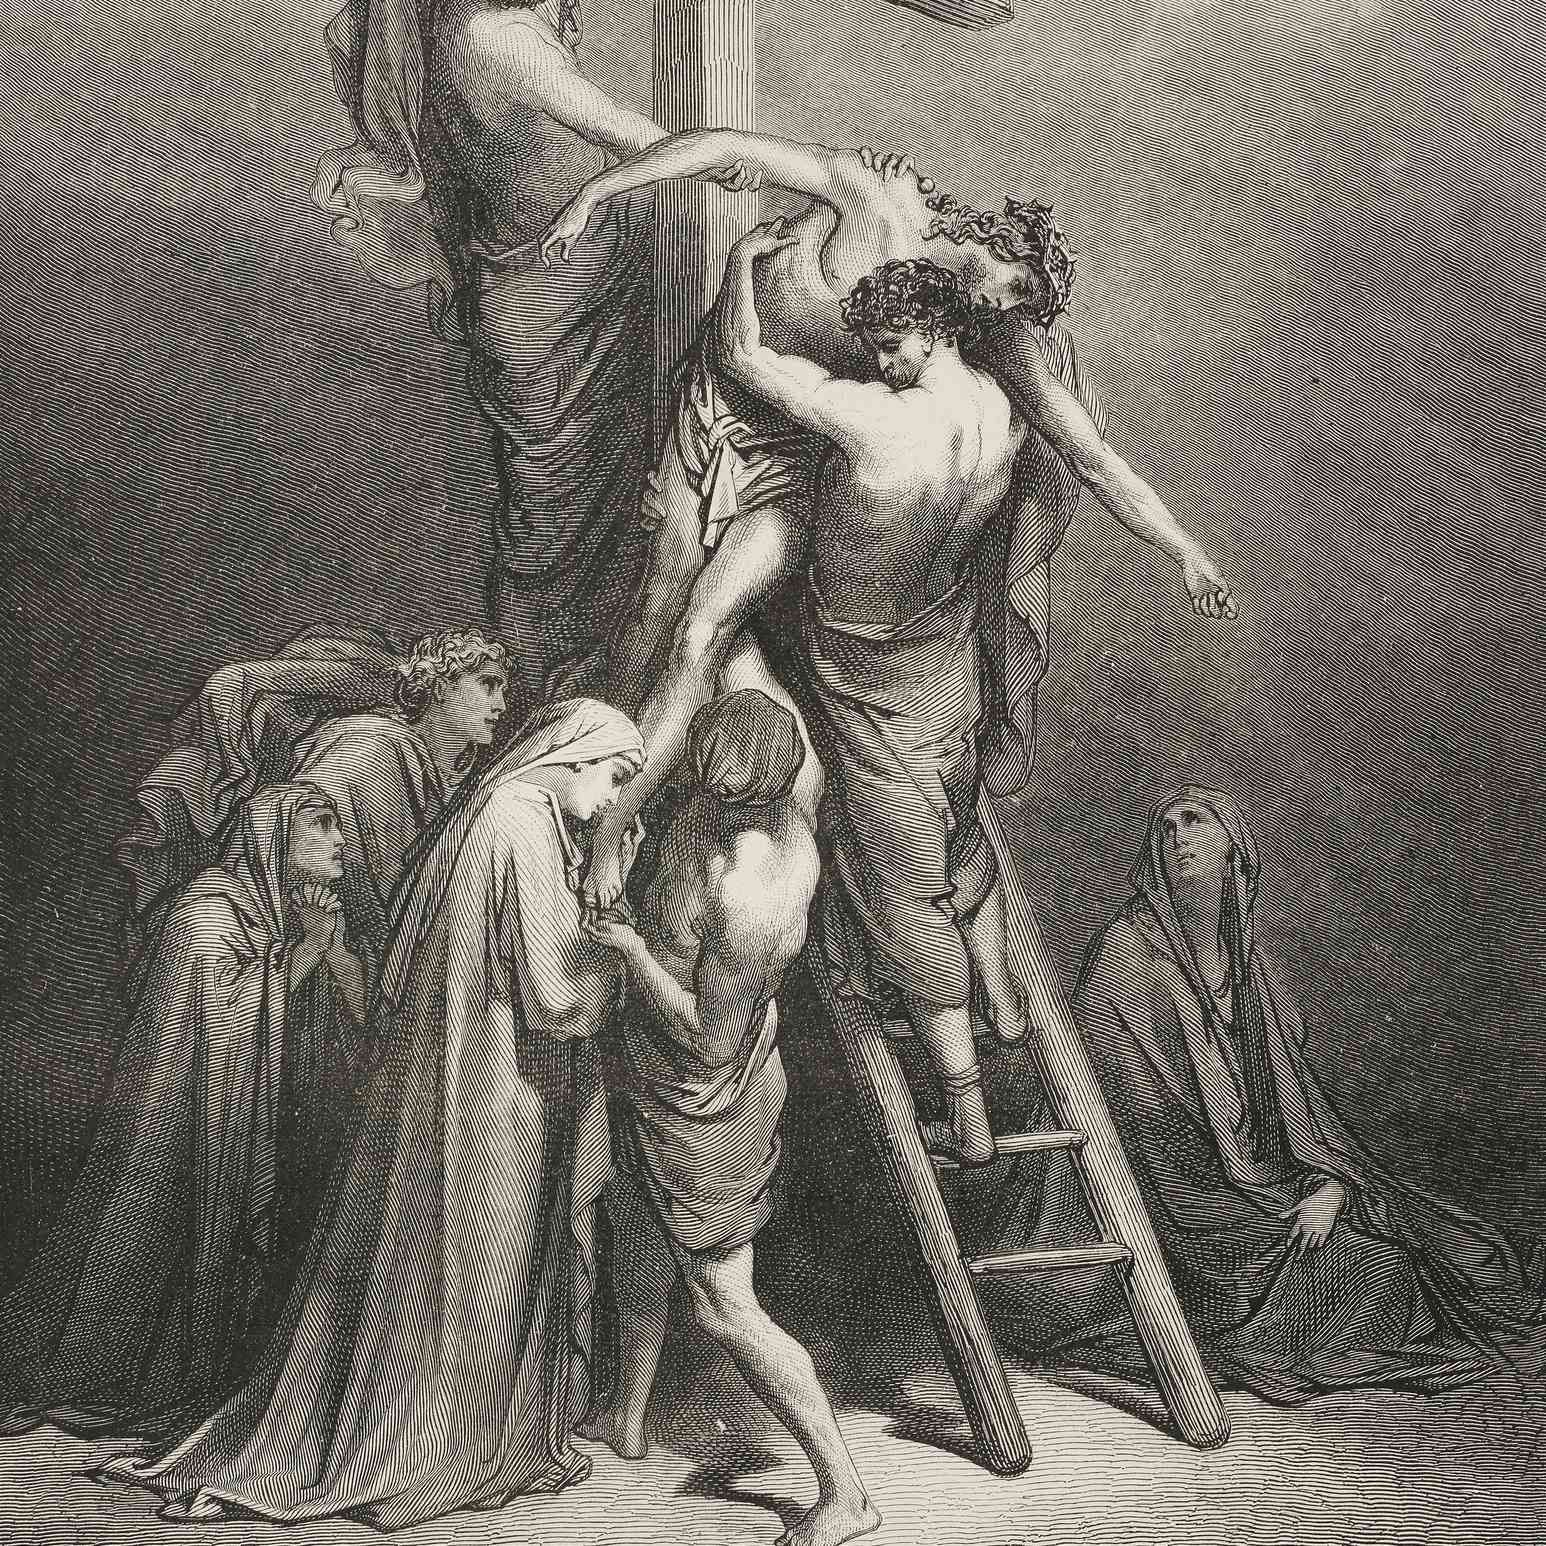 Joseph of Arimathea brings Jesus down from cross